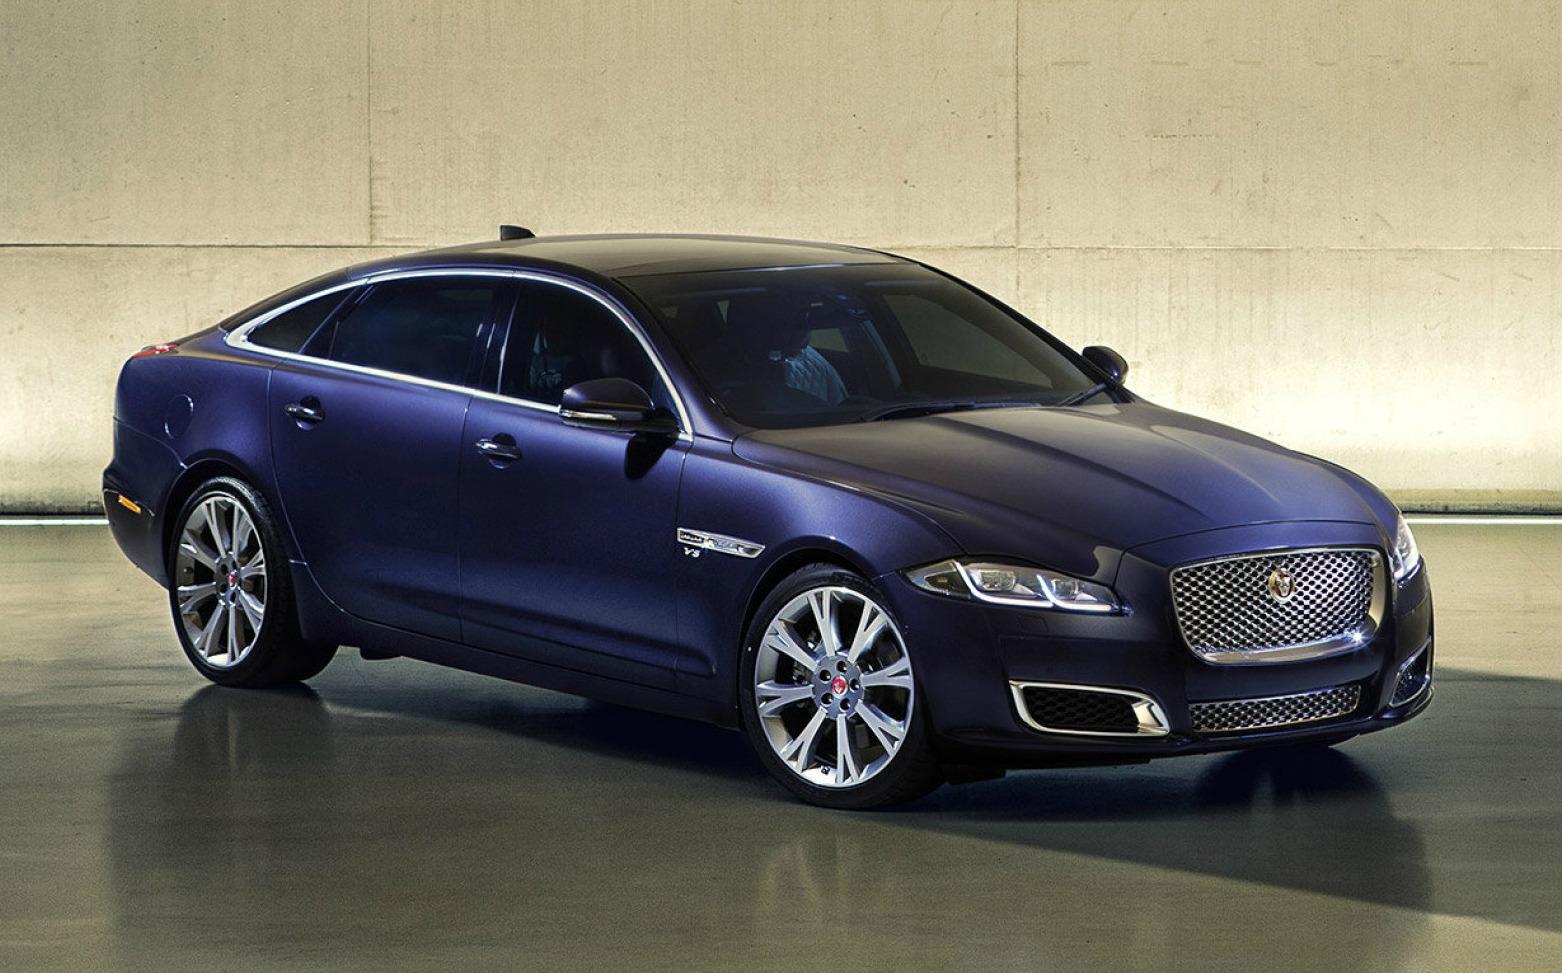 nuova Jaguar XJ elettrica 2020